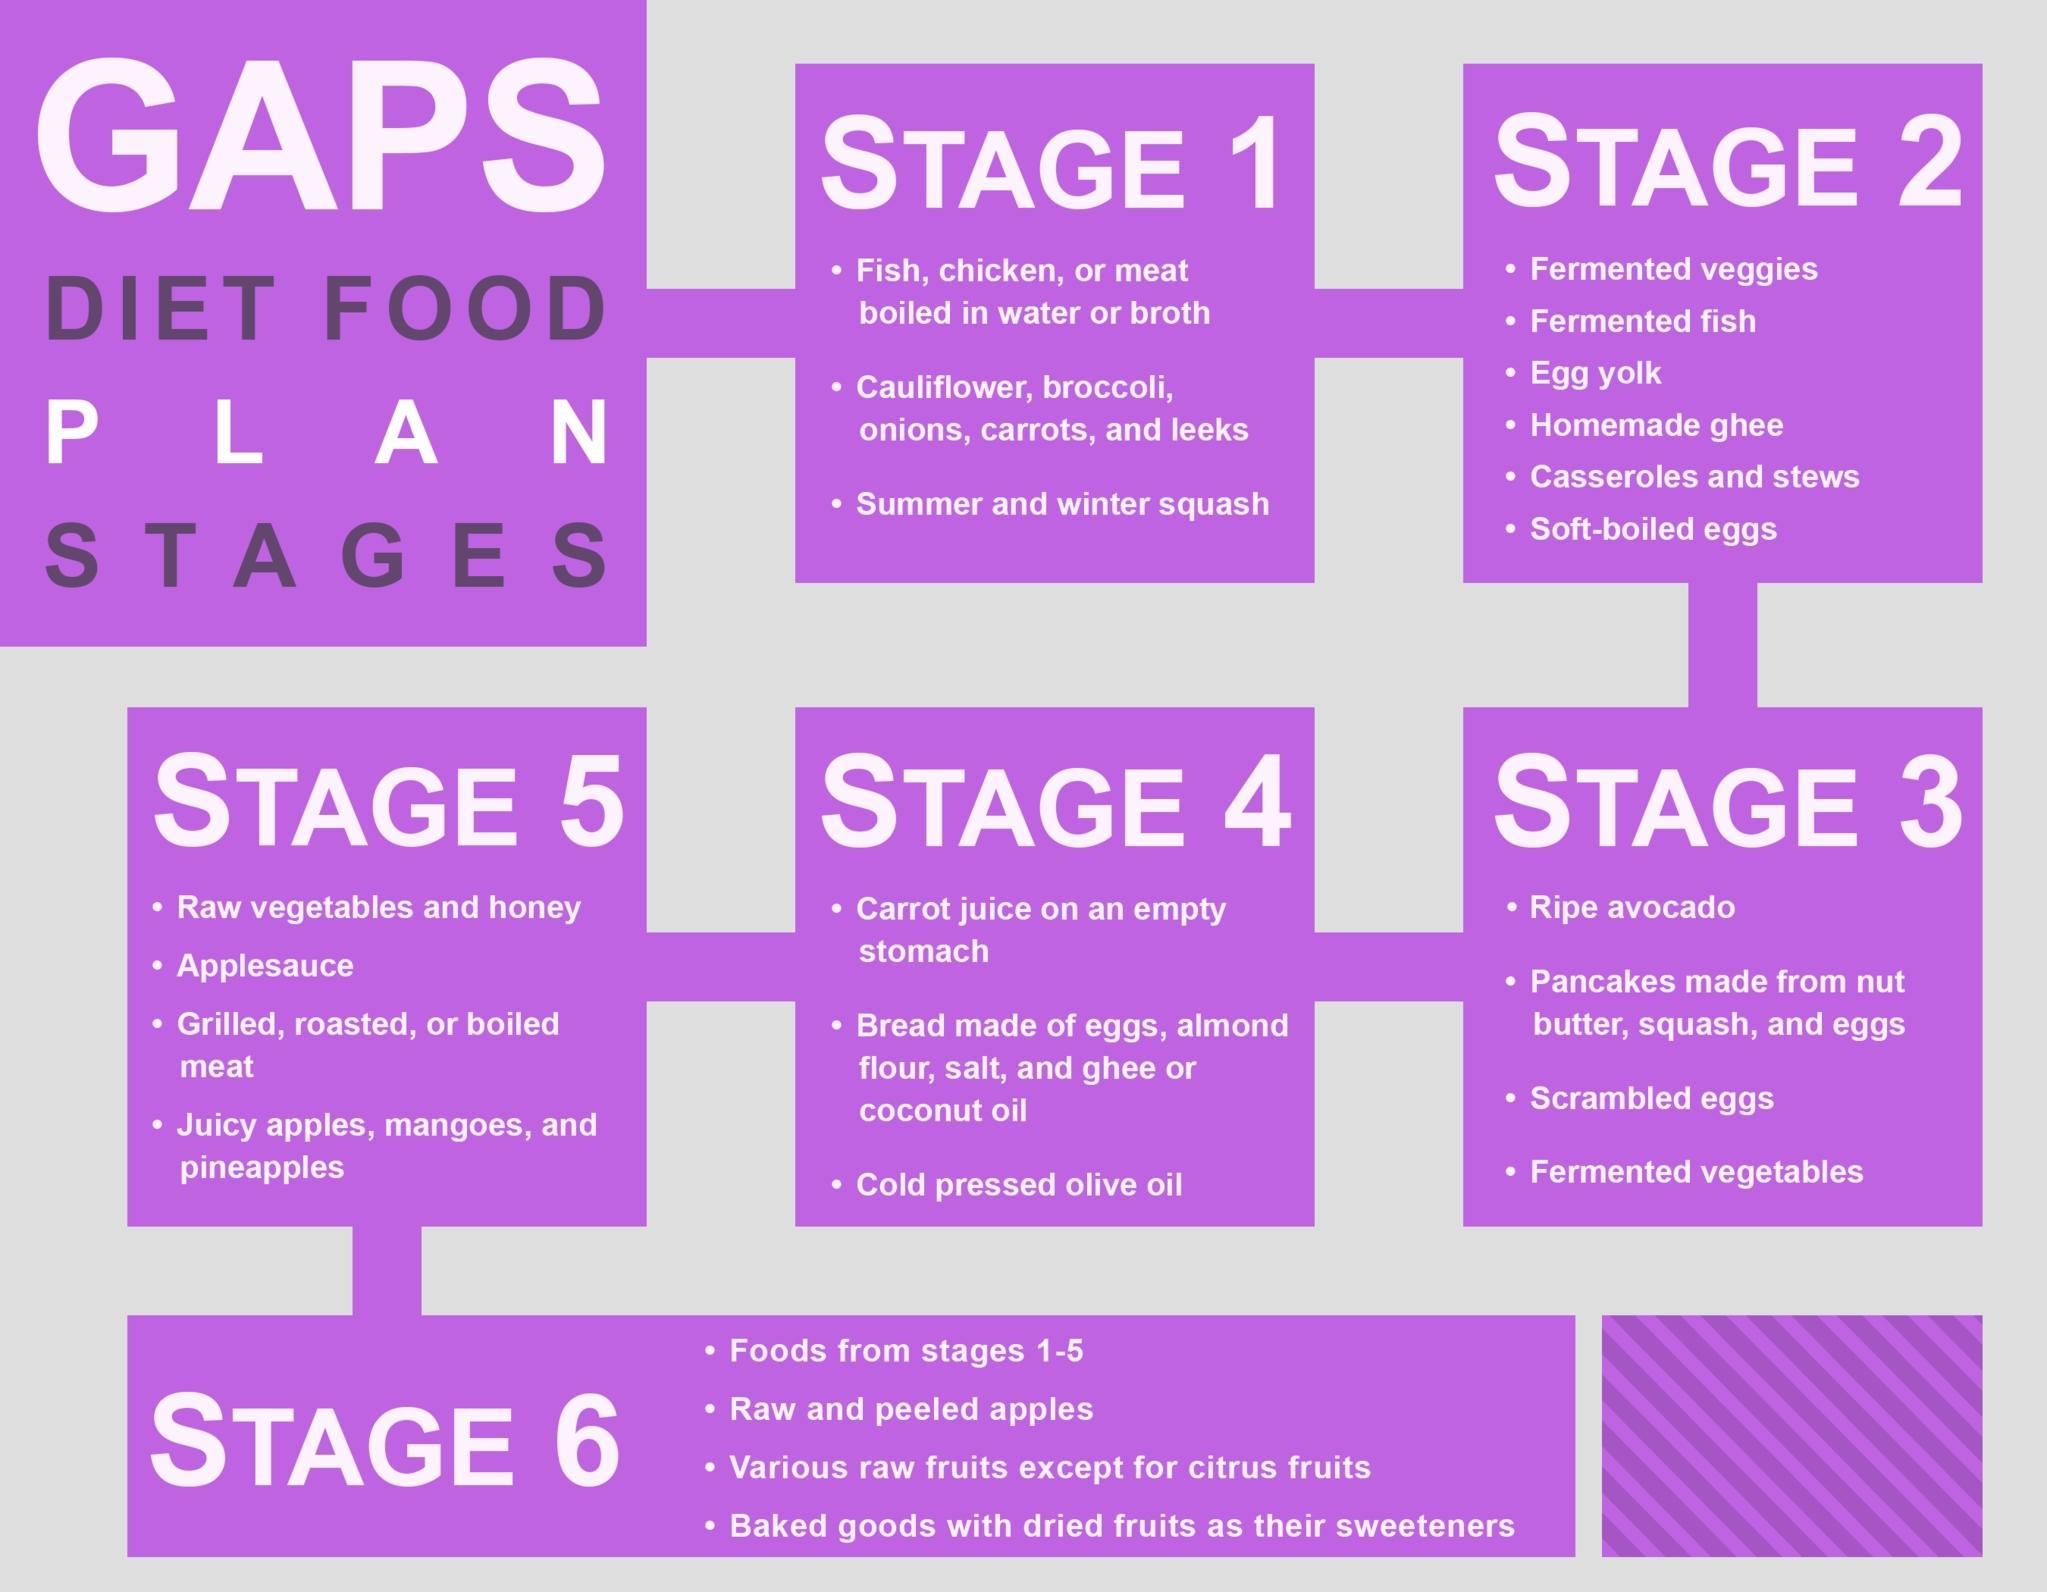 Gaps Diet Food